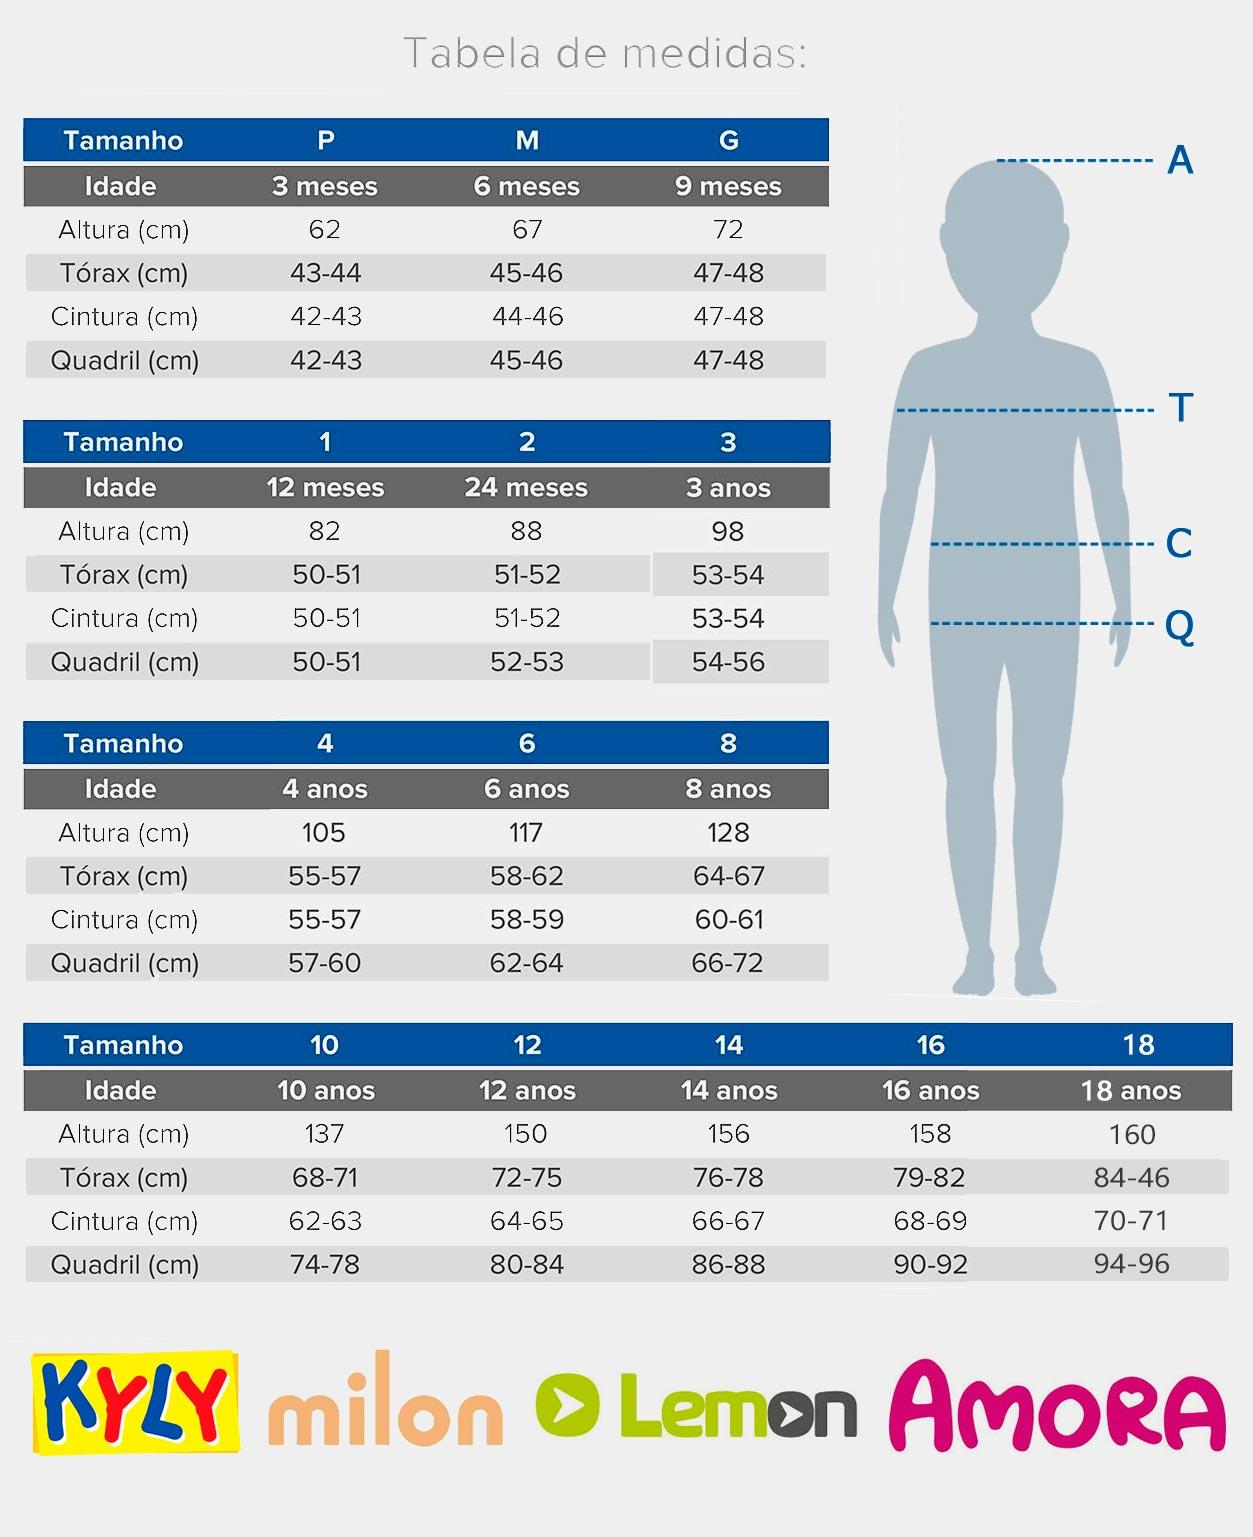 Vestido Infantil Curto Azul Flor - Kyly: Tabela de medidas